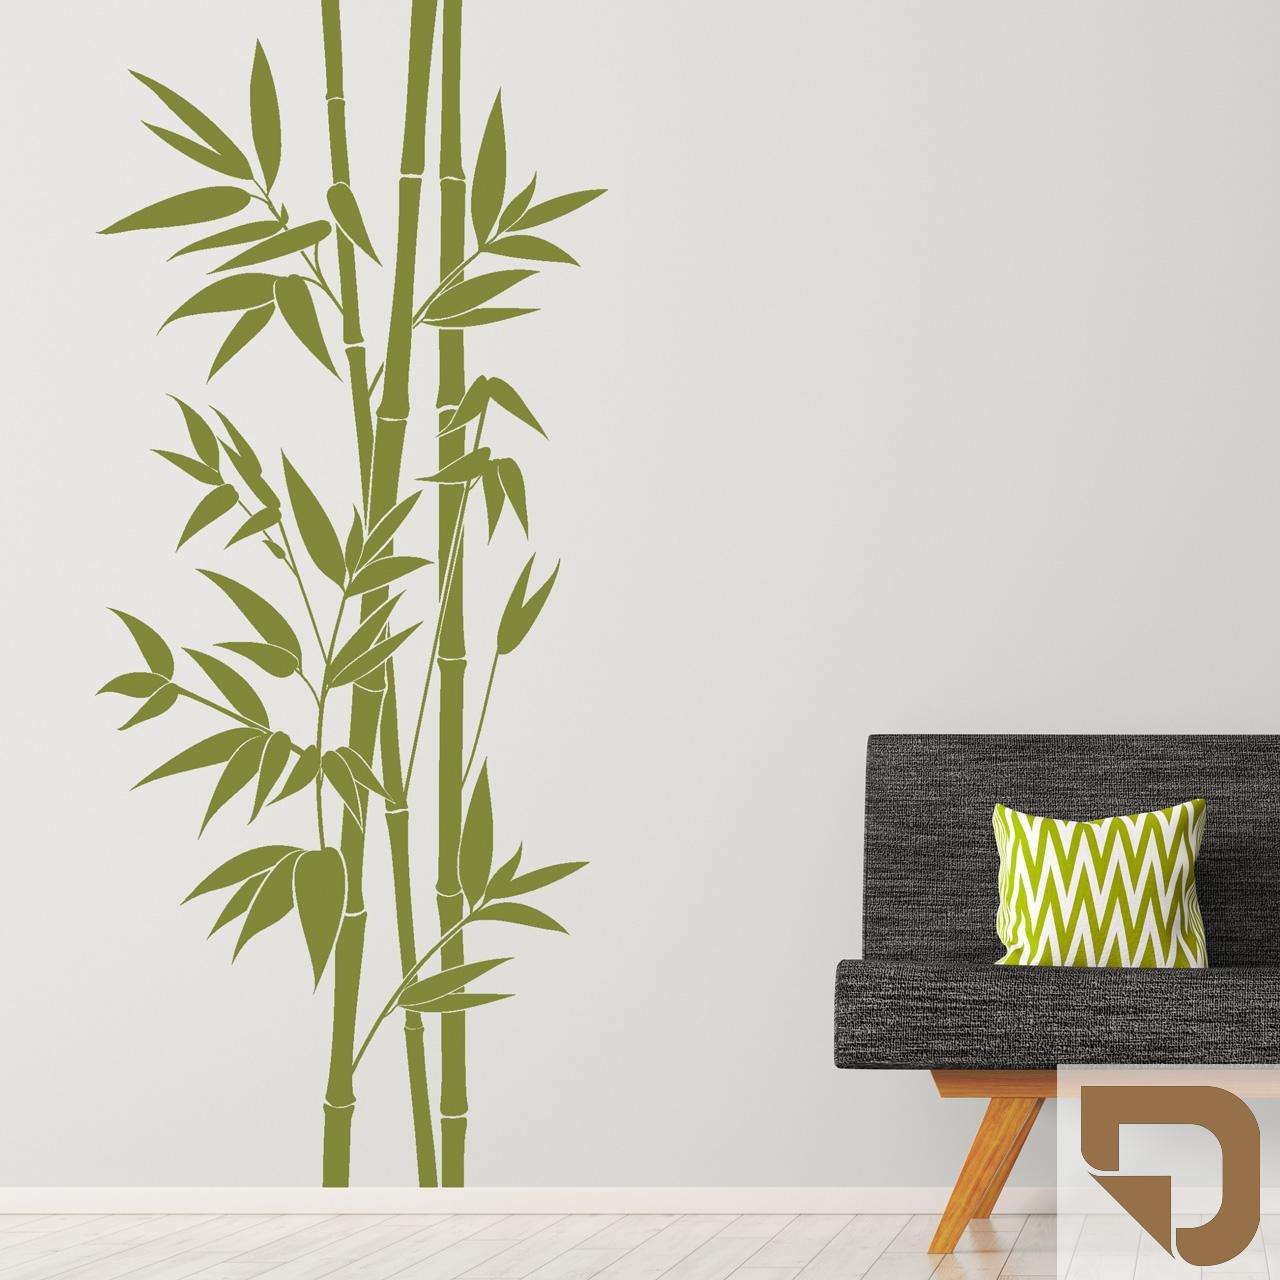 DESIGNSCAPE® Wandtattoo Wandtattoo Wandtattoo XXL-Bambus   Wandtattoo Pflanze Bamboo 113 x 260 cm (Breite x Höhe) weiss DW804164-L-F5 B071VV4P6F Wandtattoos & Wandbilder 596ea0